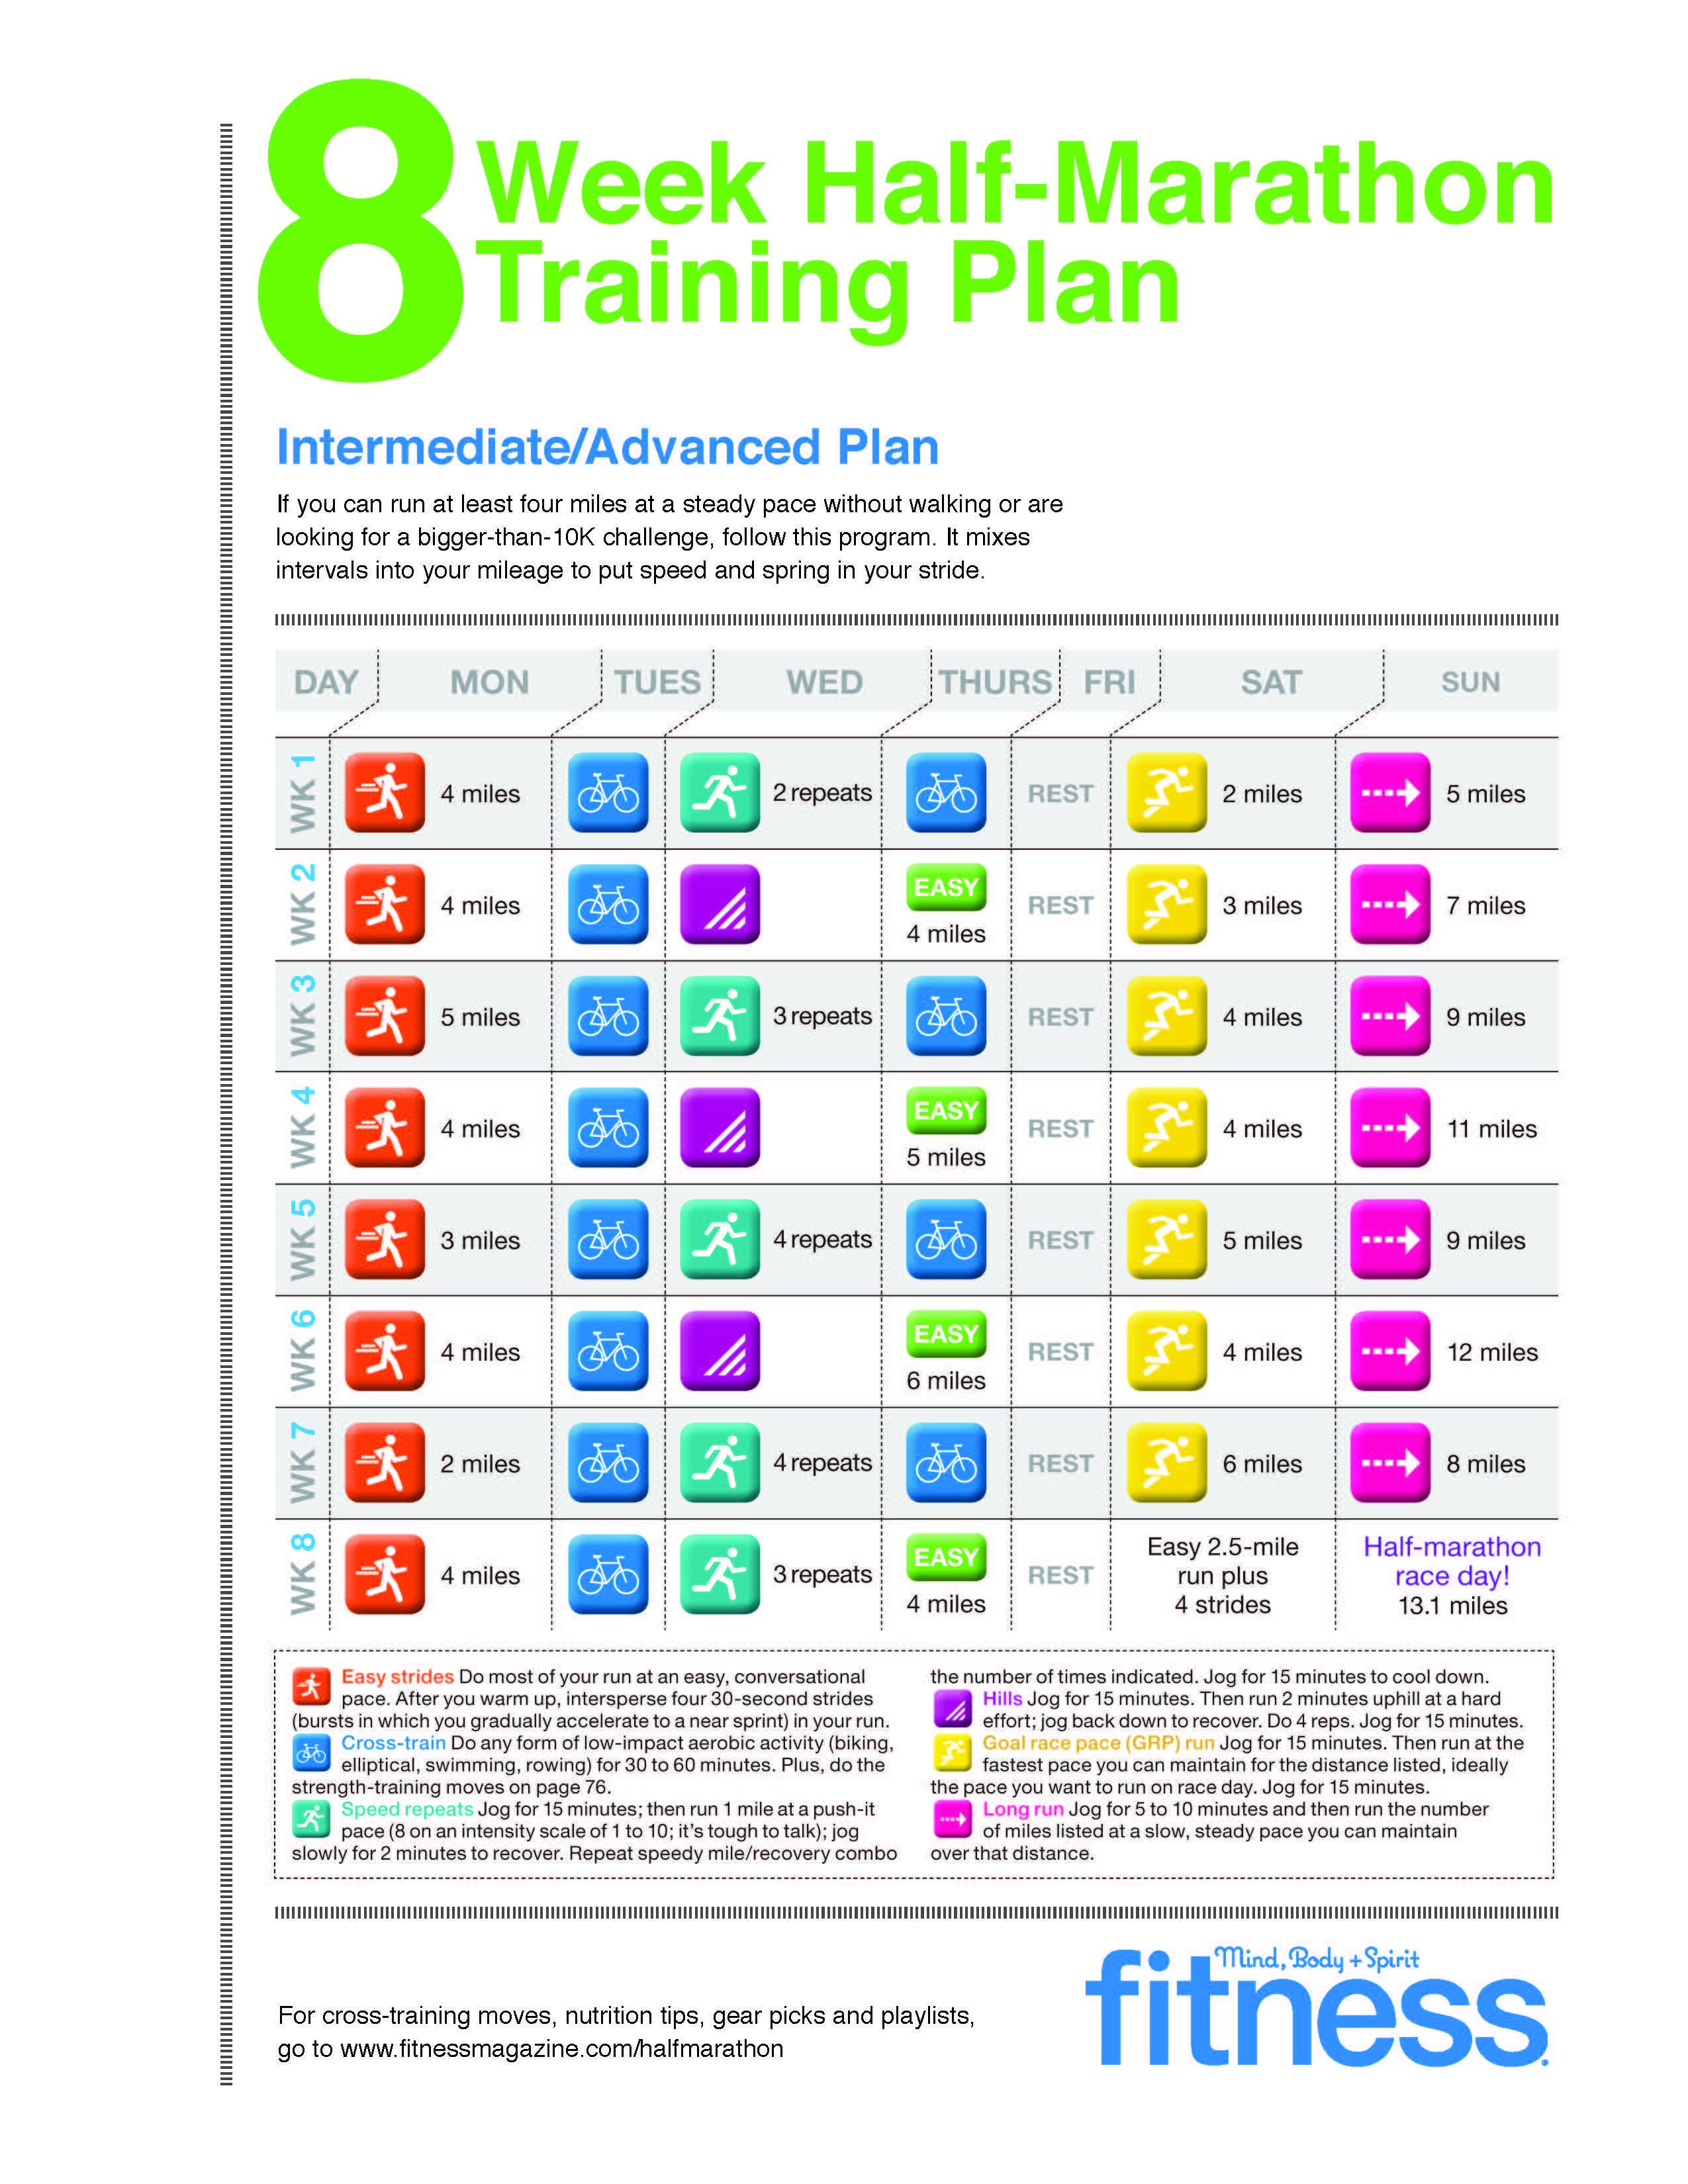 HalfMarathon Training Plan IntermediateAdvanced  Training